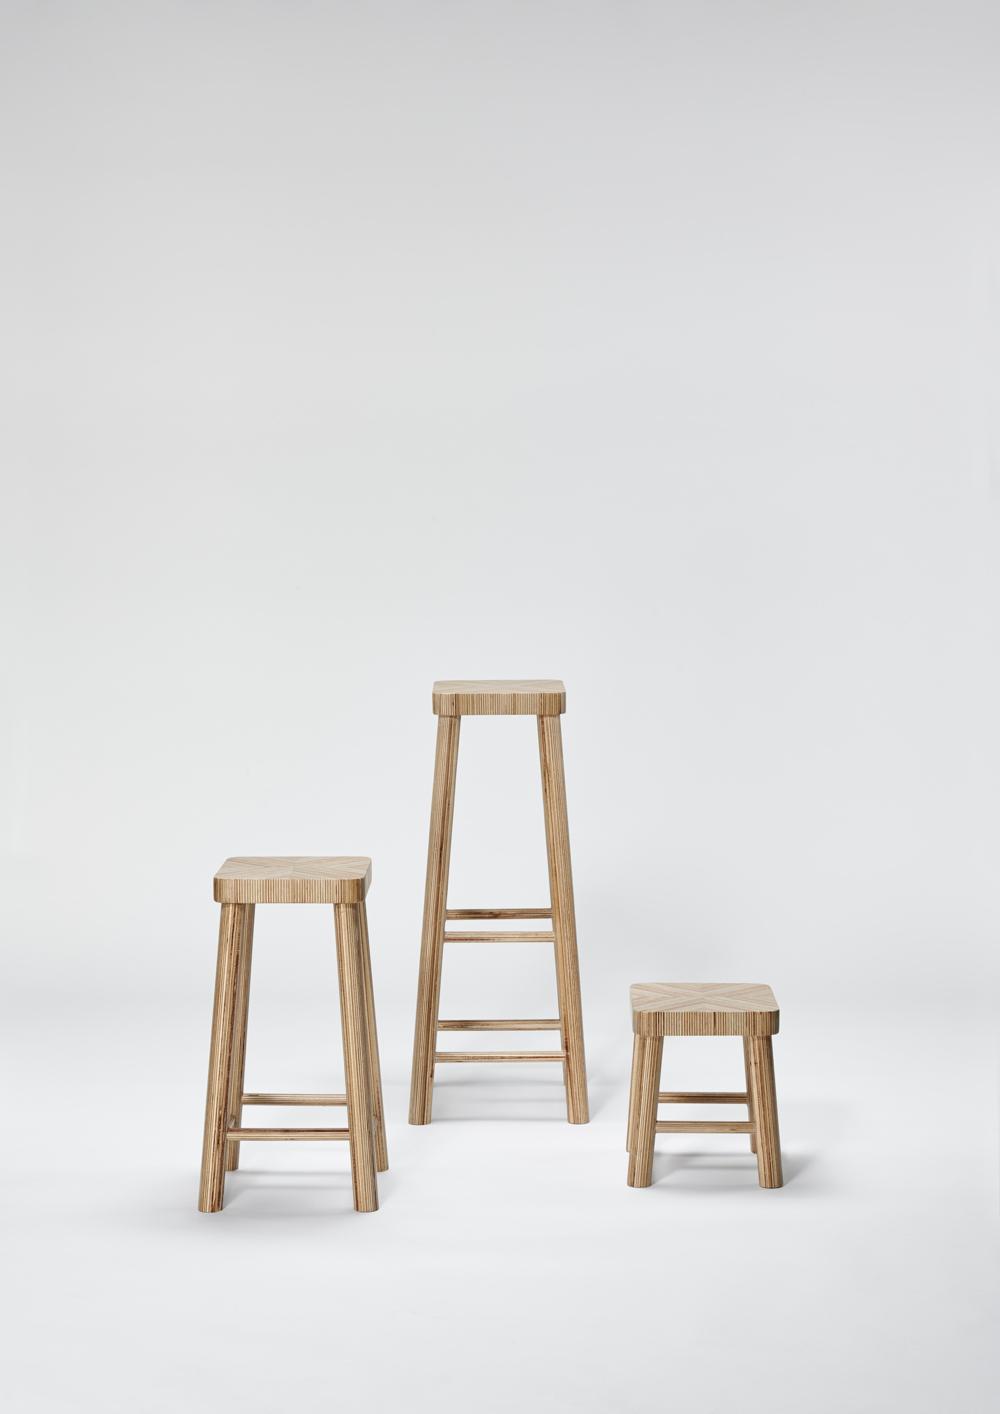 Delica Just In Case stools